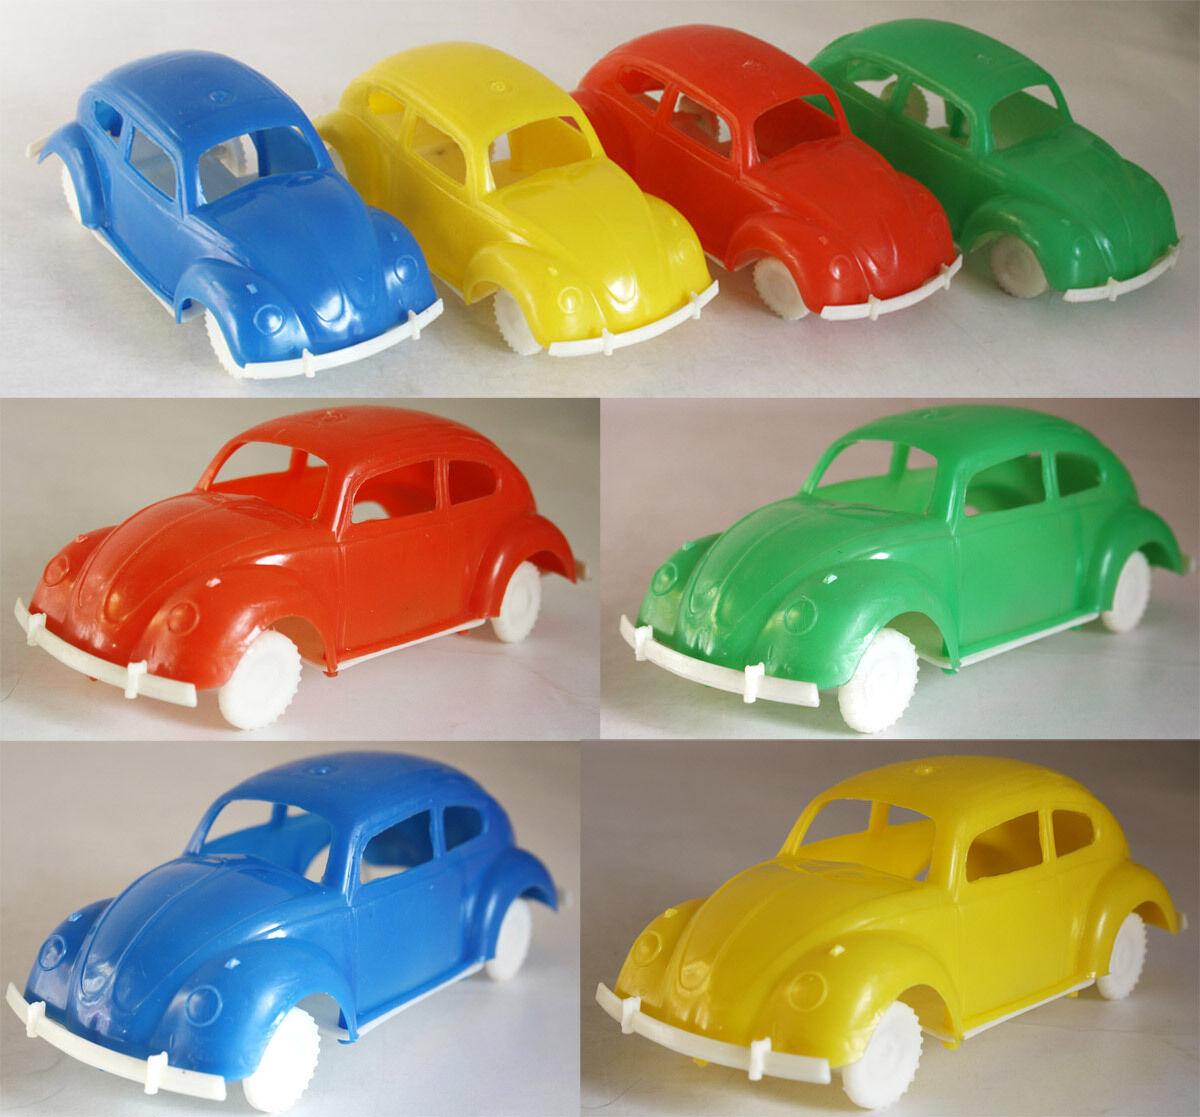 4X RARE VINTAGE 60'S MOUSTAKAS VOLKSWAGEN 1200 BUG PLASTIC VW GREEK TRUMPF NEW